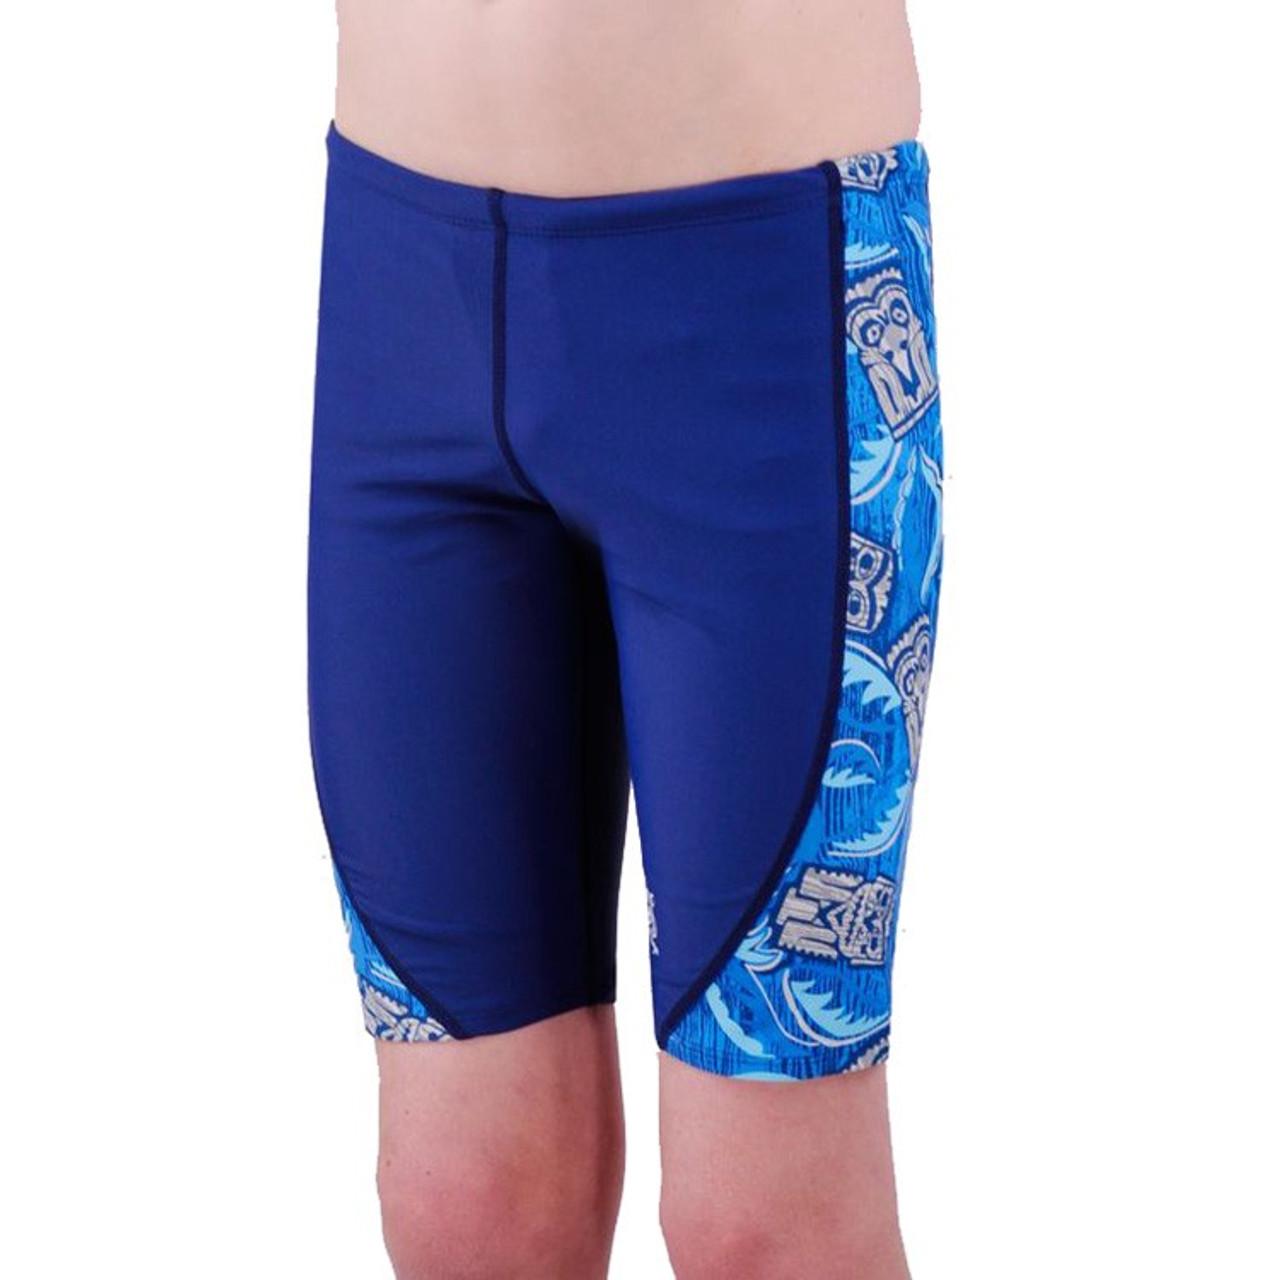 6320ce5e695b3 Boys Tuga Jammer Swim Shorts Cobalt Blue | Boys UV Clothing